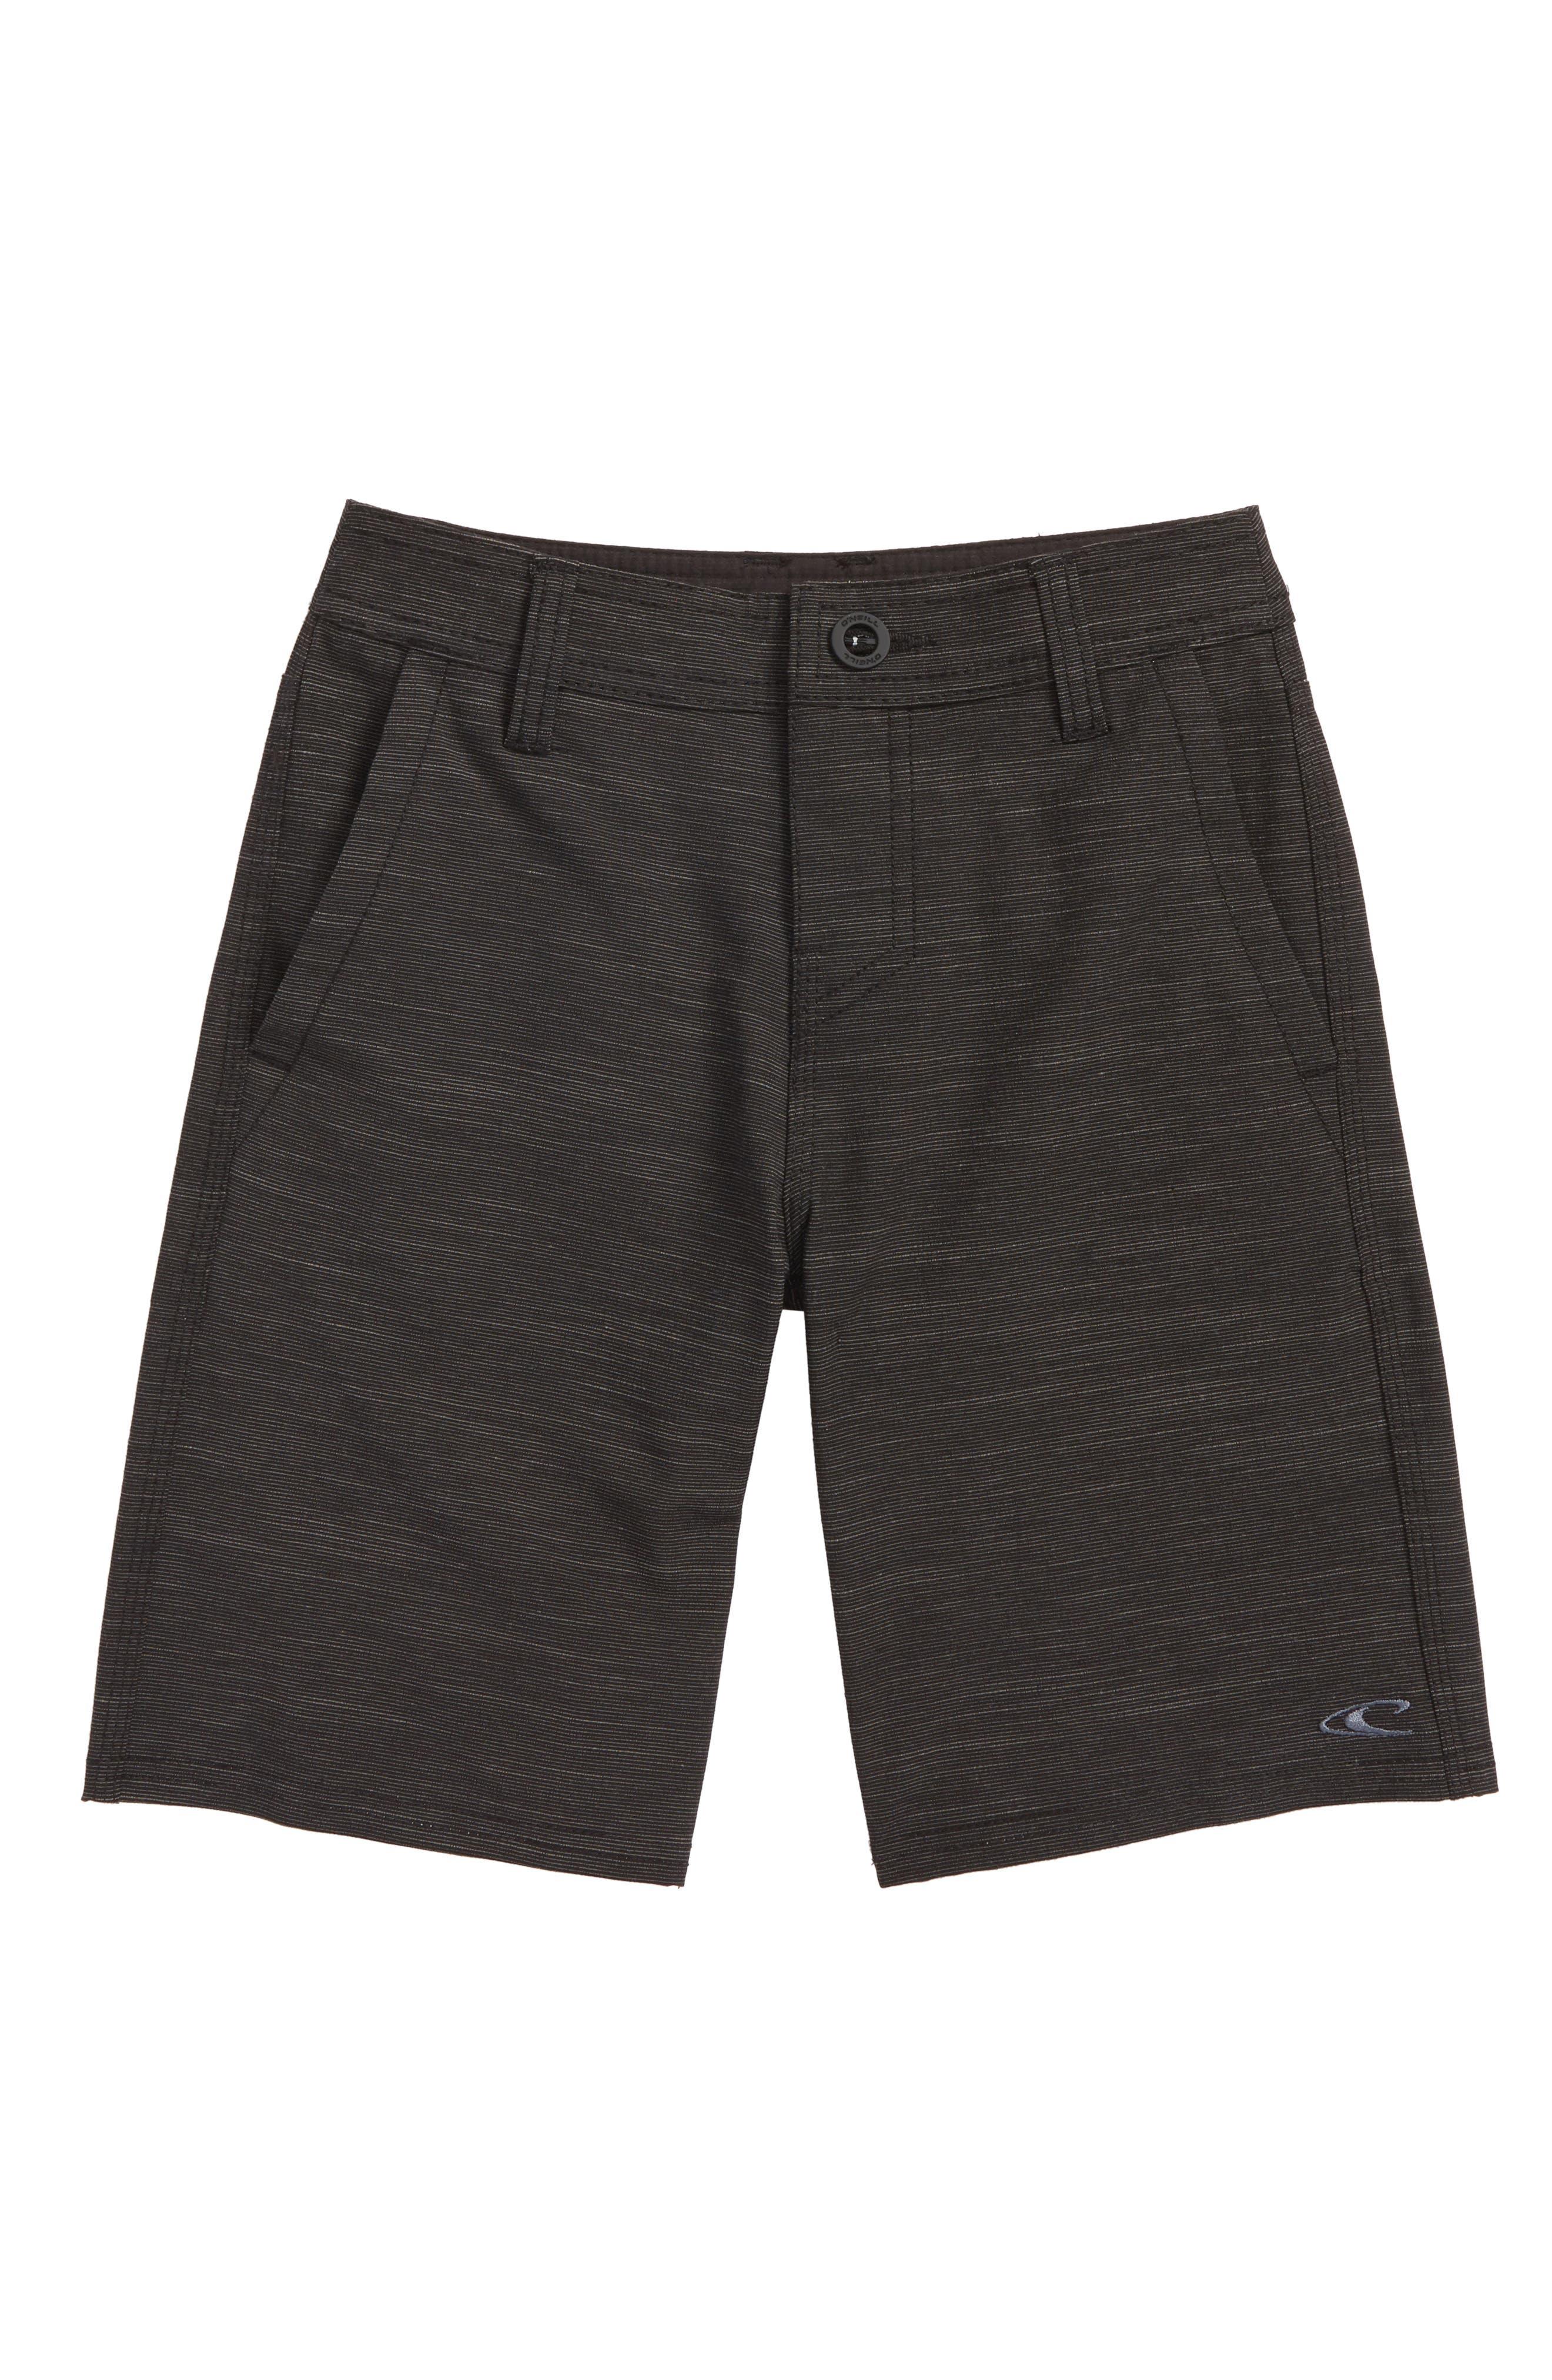 Locked Slub Hybrid Board Shorts,                             Main thumbnail 1, color,                             001